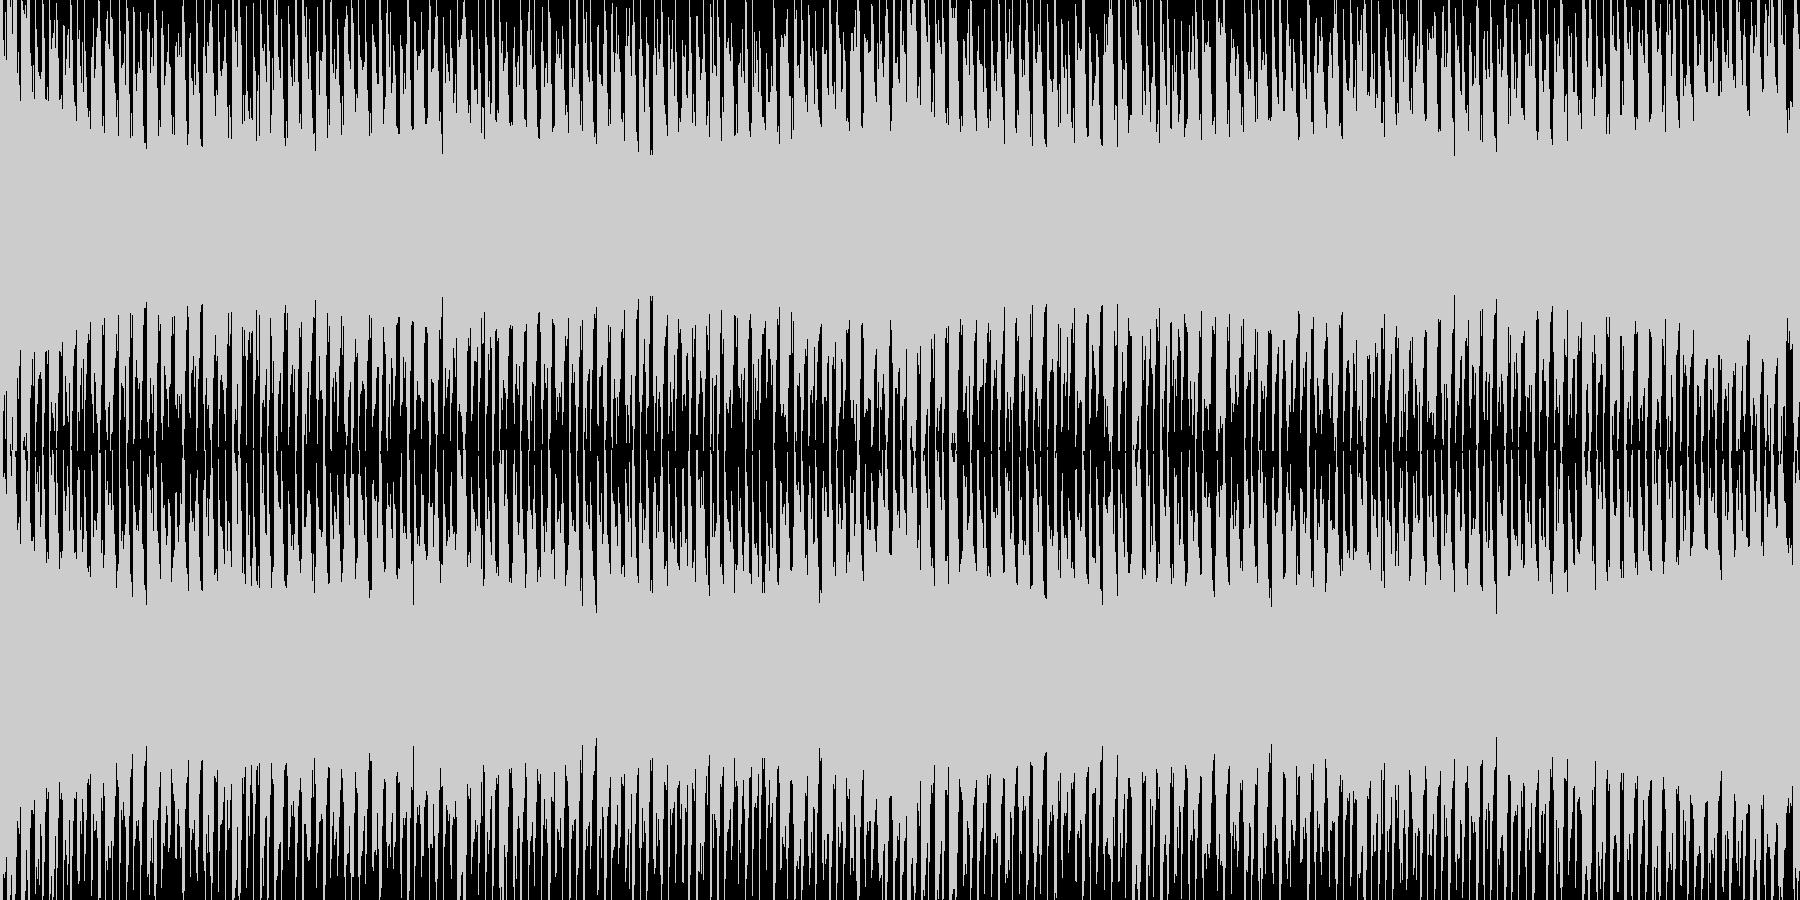 【EDMループ素材】企業・映像制作向きHの未再生の波形